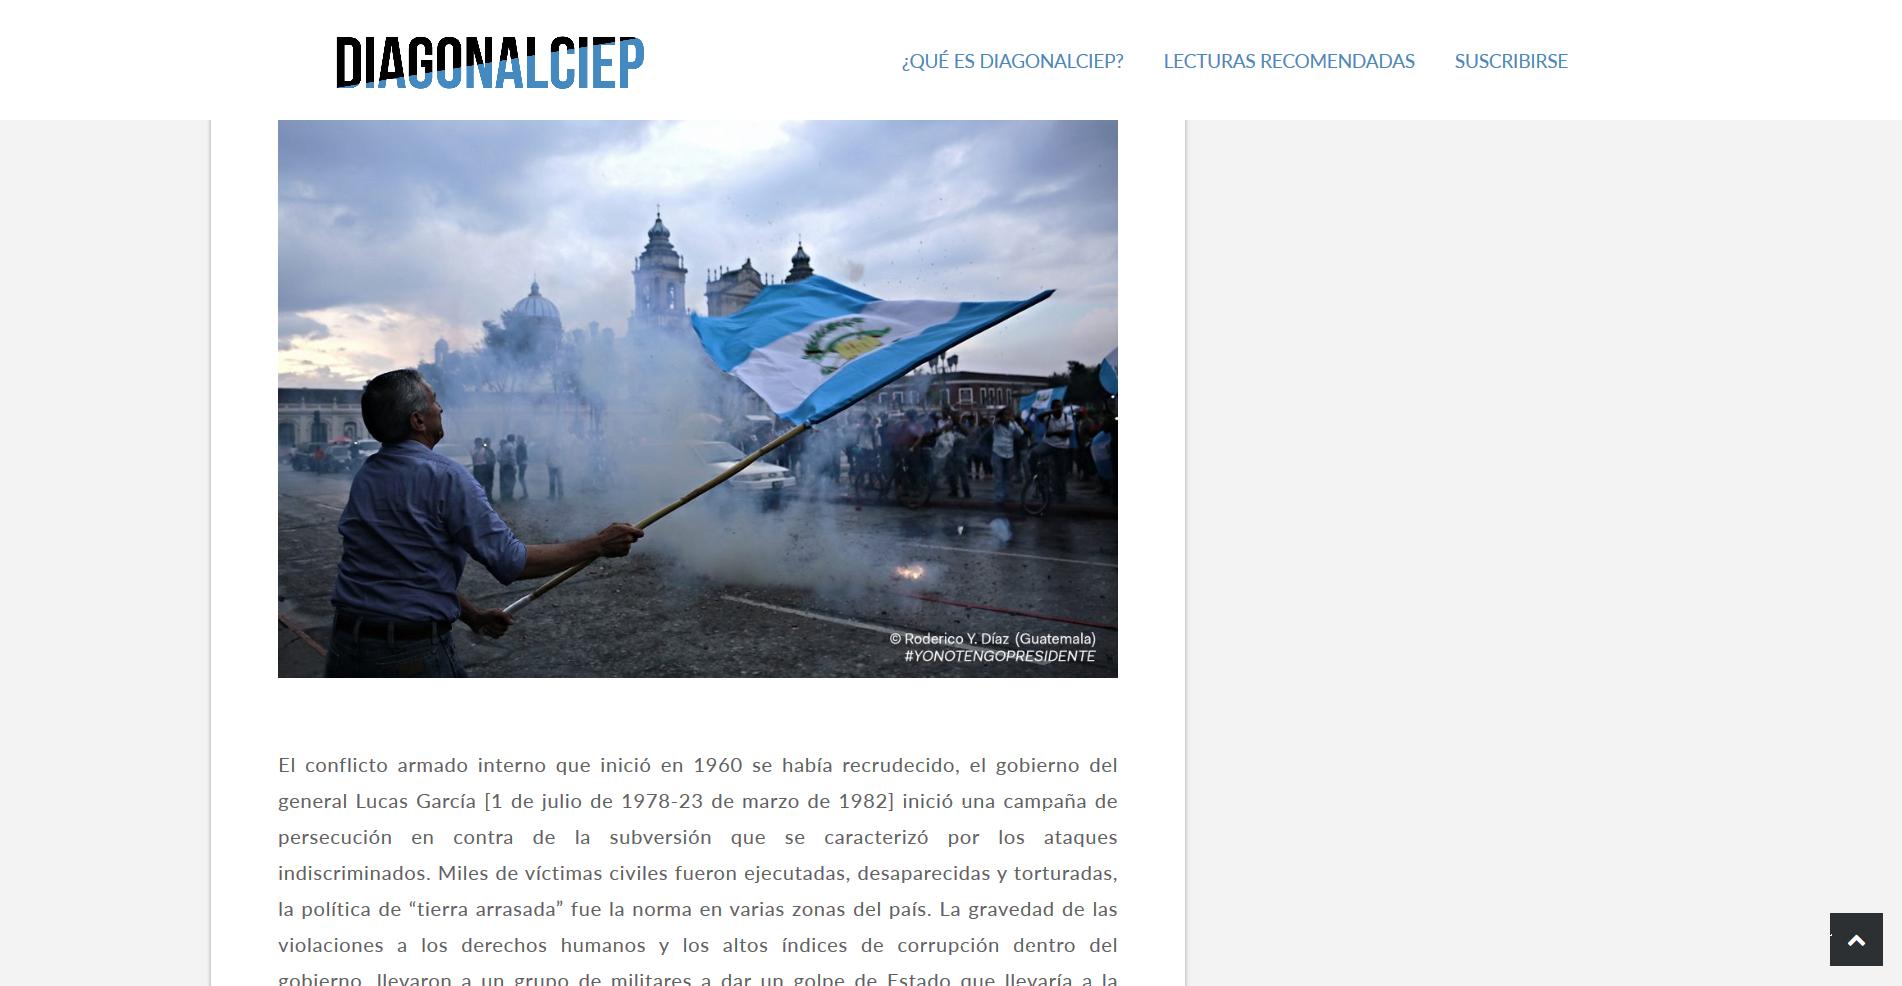 Screenshot_2019-05-23 José E Ríos Montt Murió sin sentencia, pero no inocente – DIAGONALCIEP.png